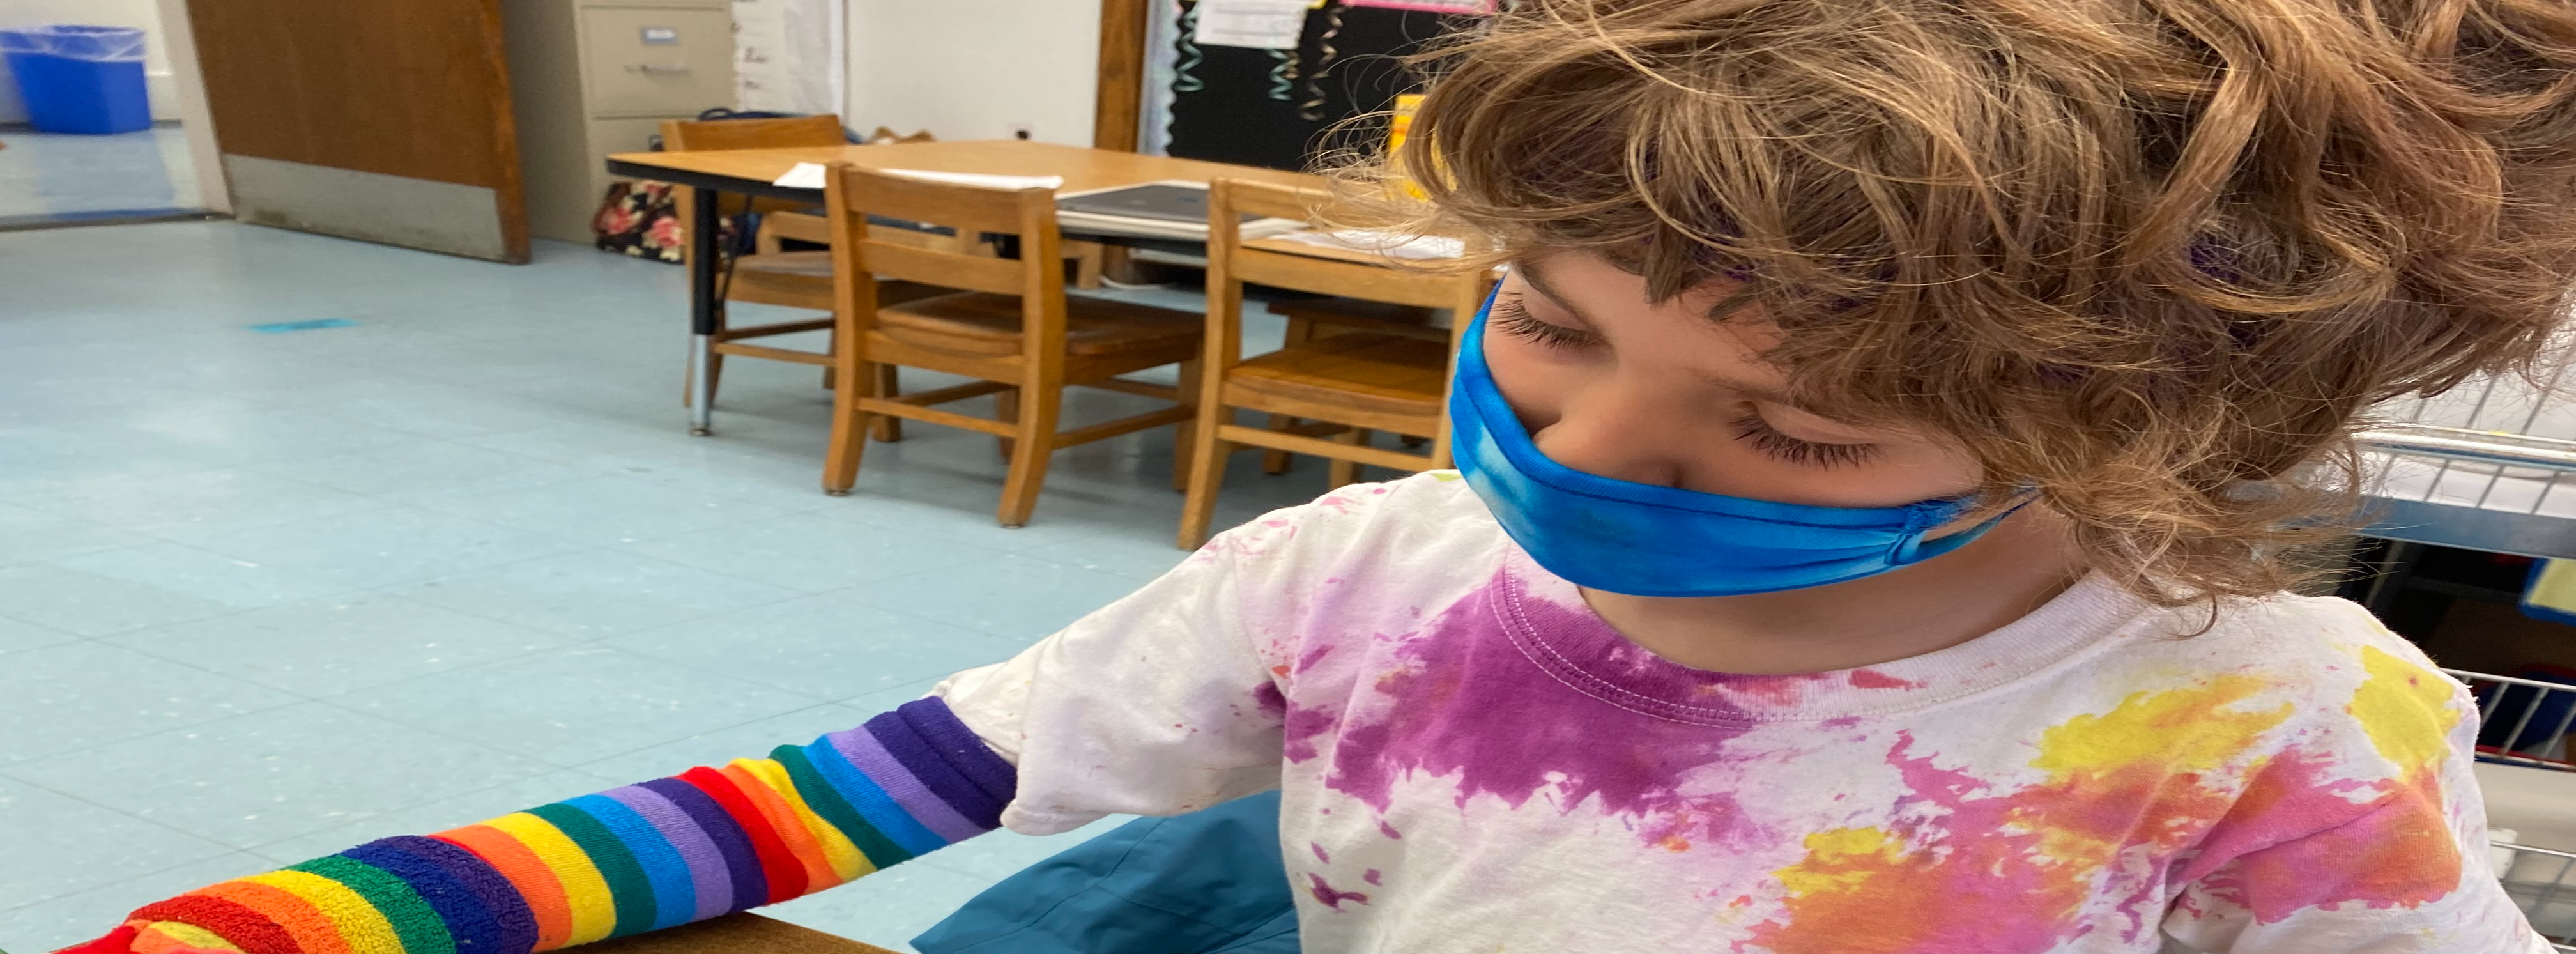 Sag Harbor Elementary School celebrates Spirit Week